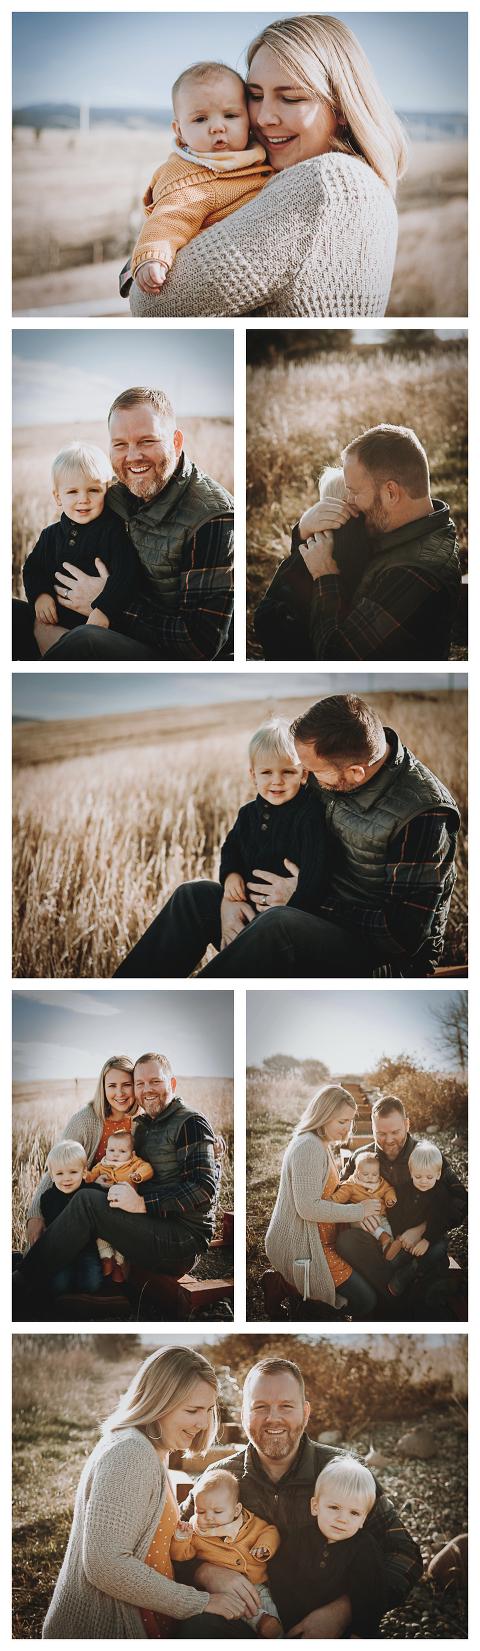 Coyne Family, Haberman Family, Lifestyle session captured by Hailey Haberman, Ellensburg, WA